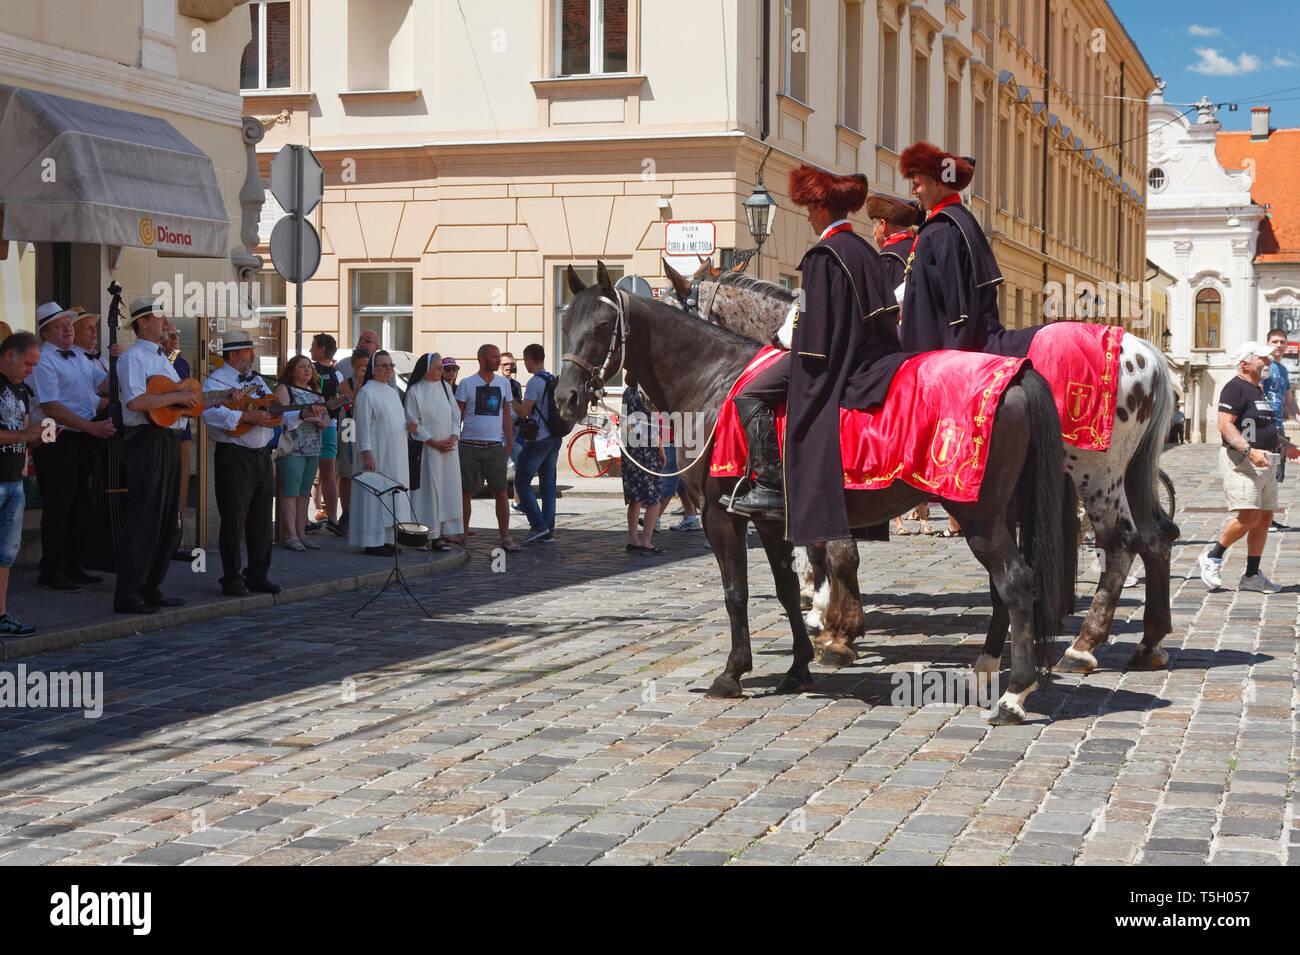 Cravat Regiment Guard of Honor, Kravat, men, horseback, Croat uniforms, St. Marks Square, ceremonial, antique black costumes, musicians playing, St. M - Stock Image